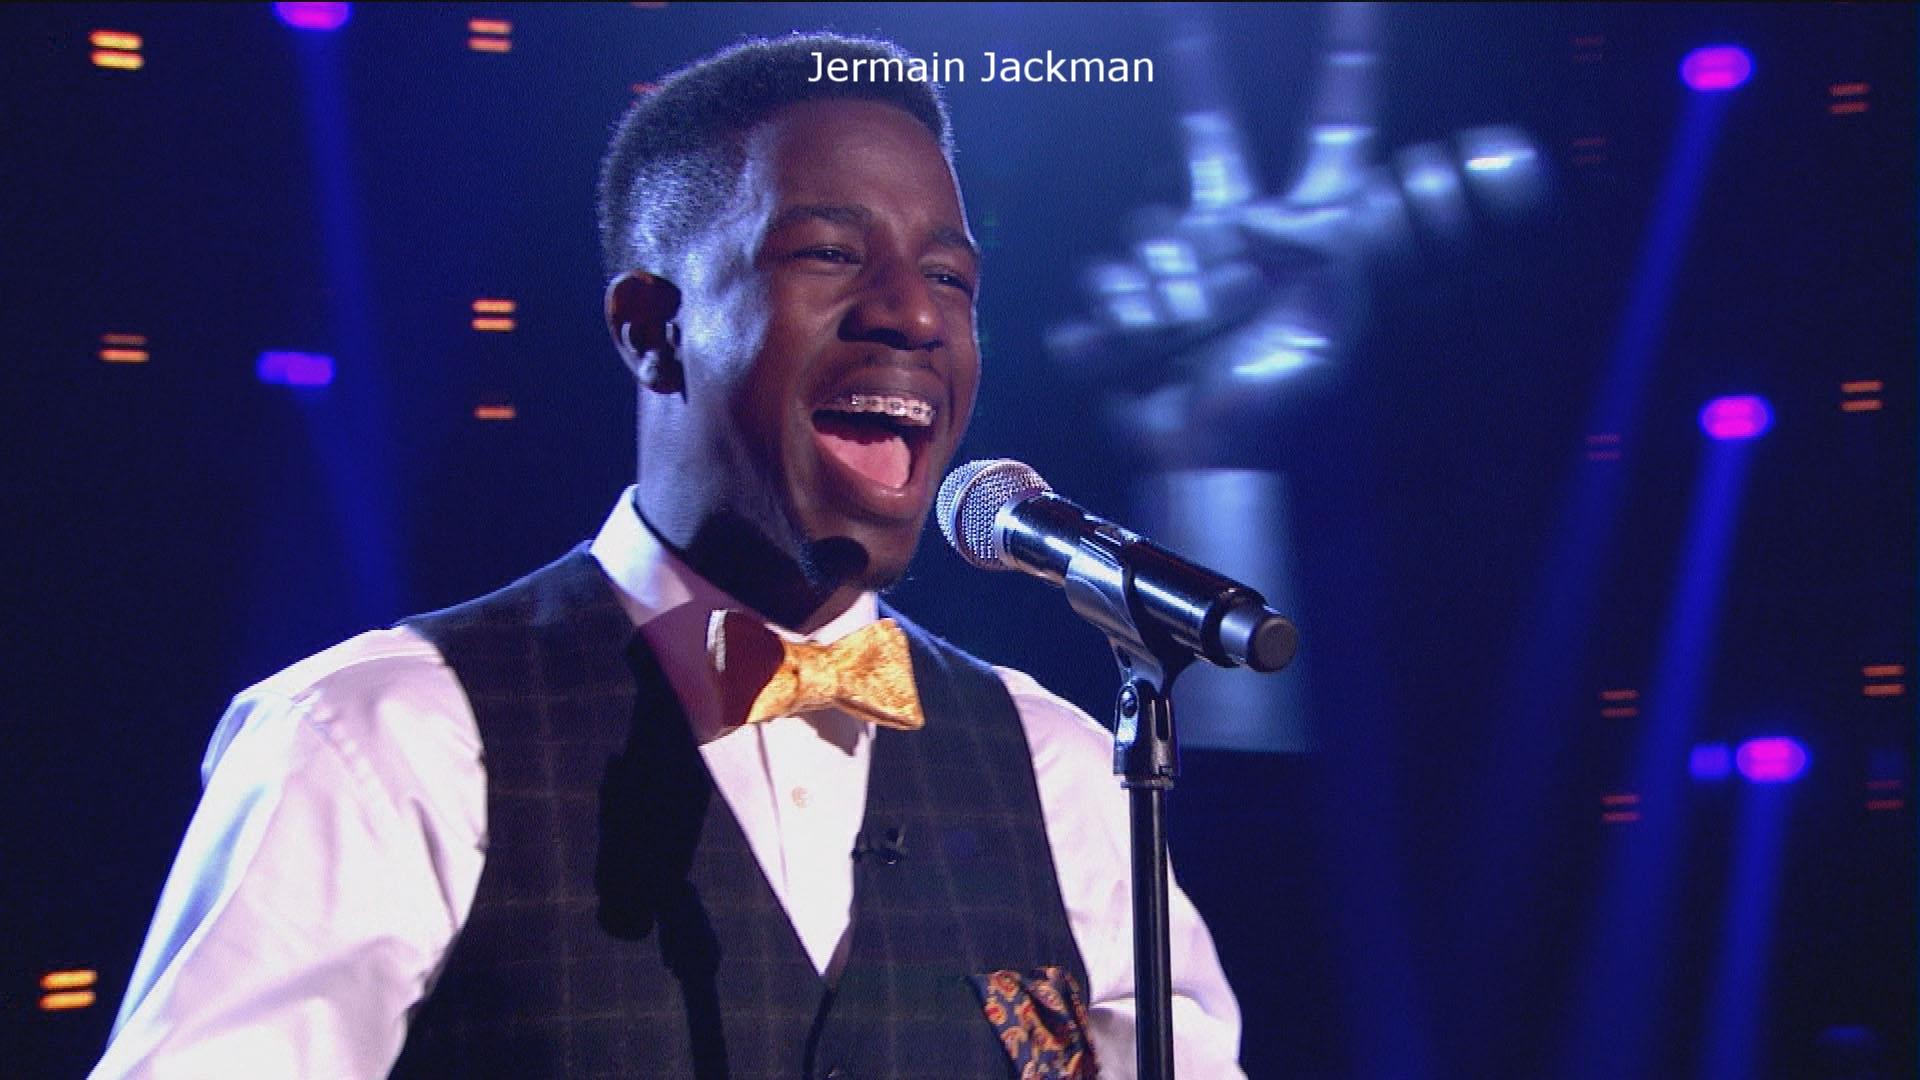 Jermain-Jackman-The-Voice.jpg